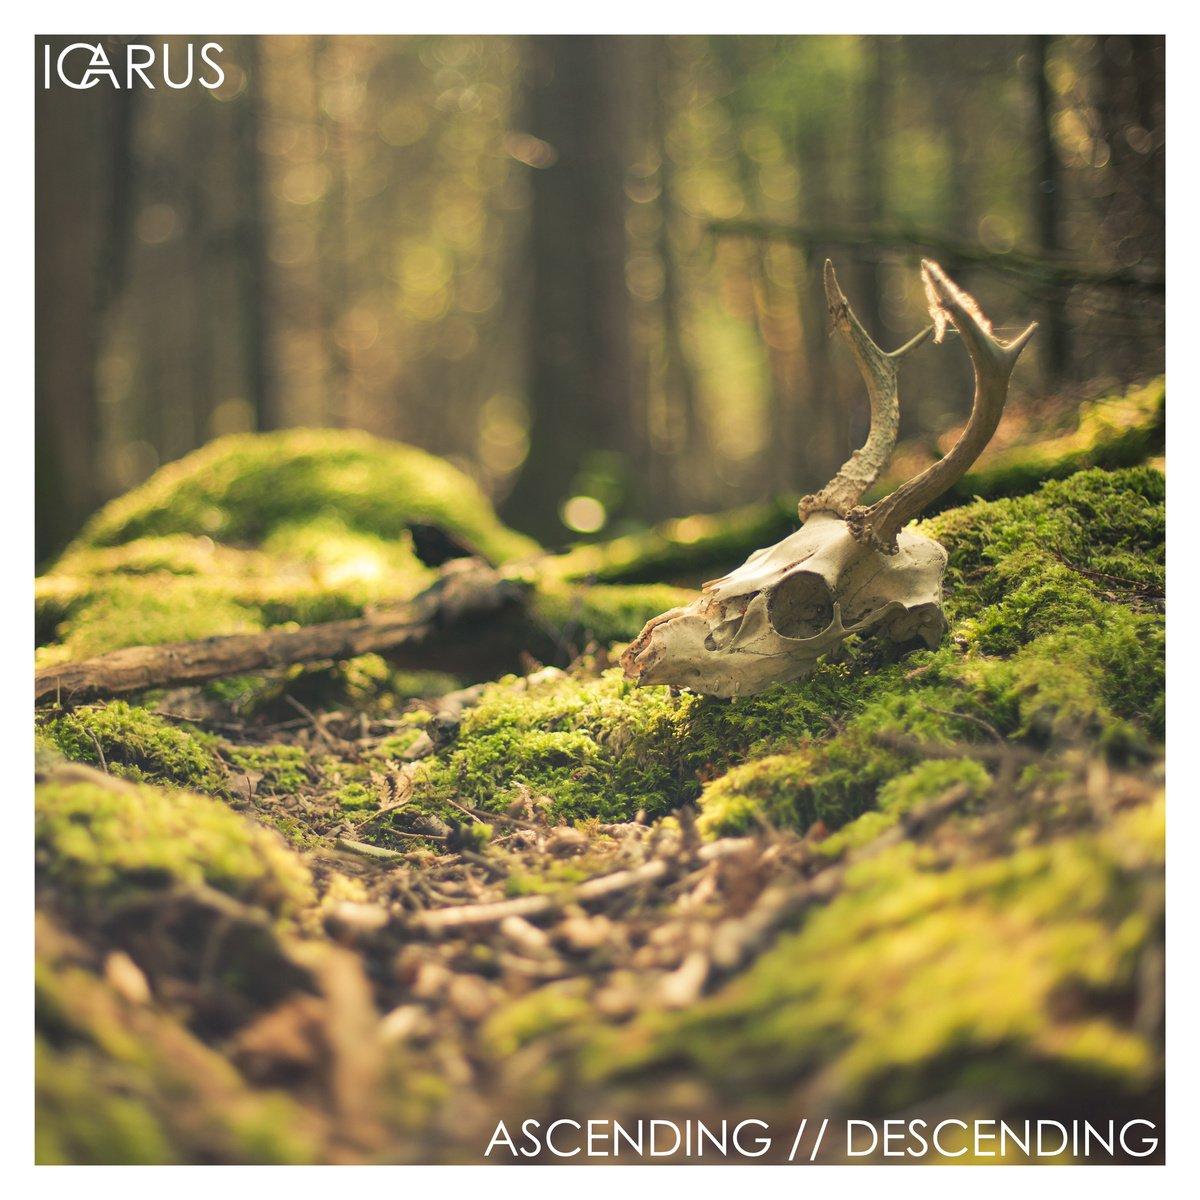 Icarus | Ascending / Descending